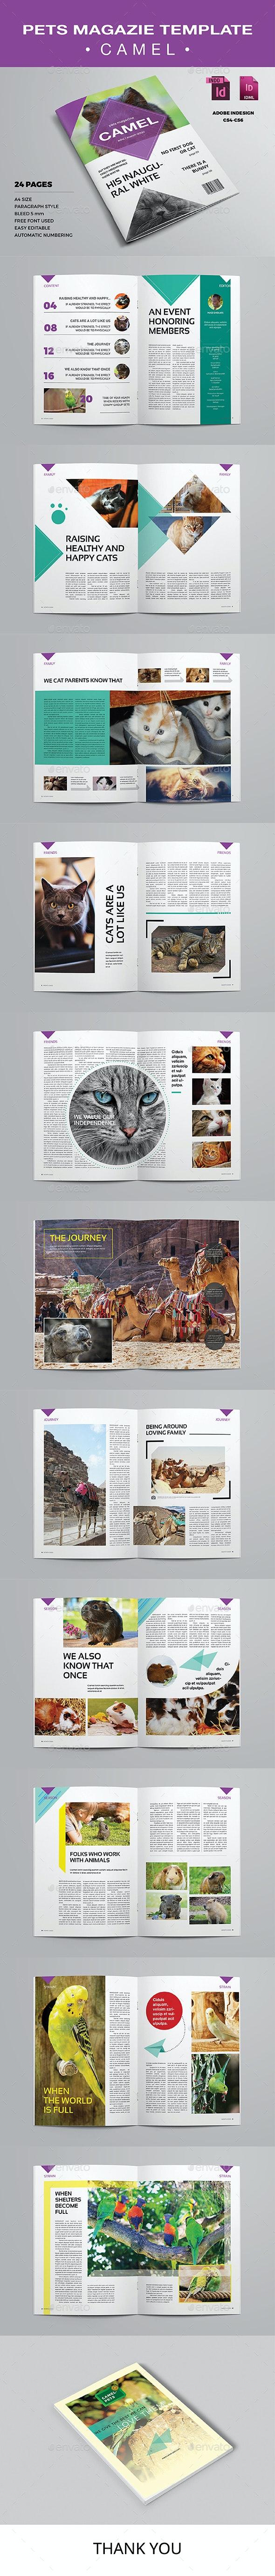 Pets Magazine Template - Camel - Magazines Print Templates